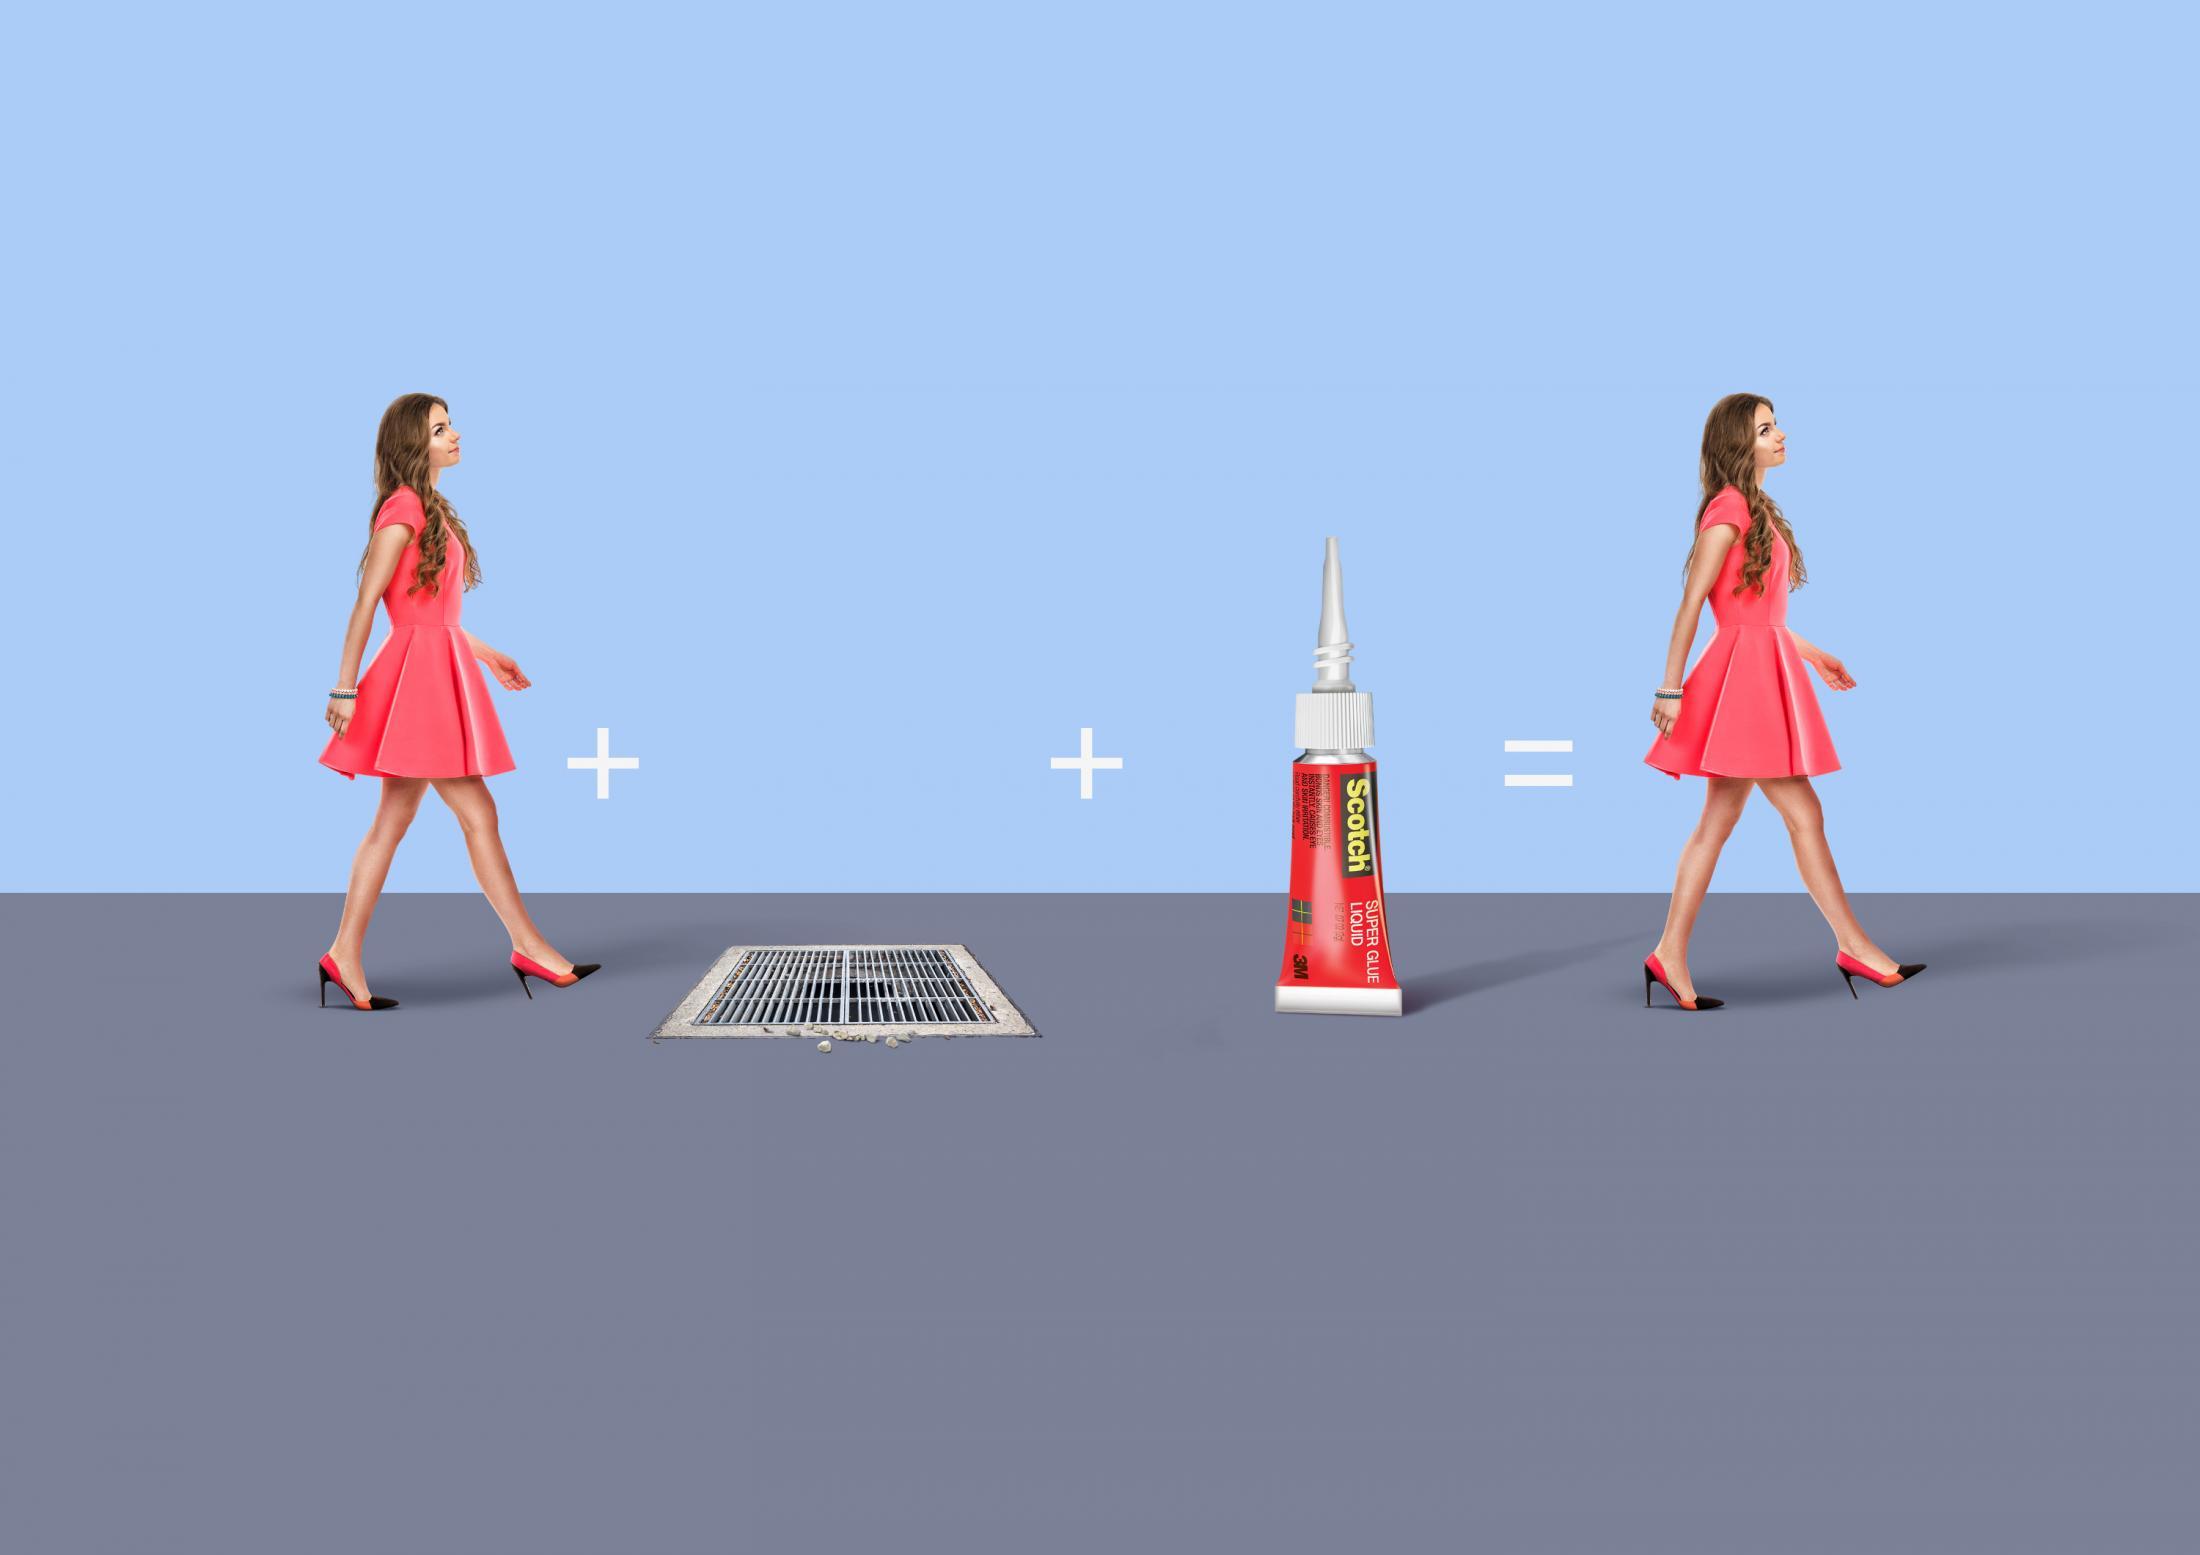 3M Print Ad - The quick fix - Manhole